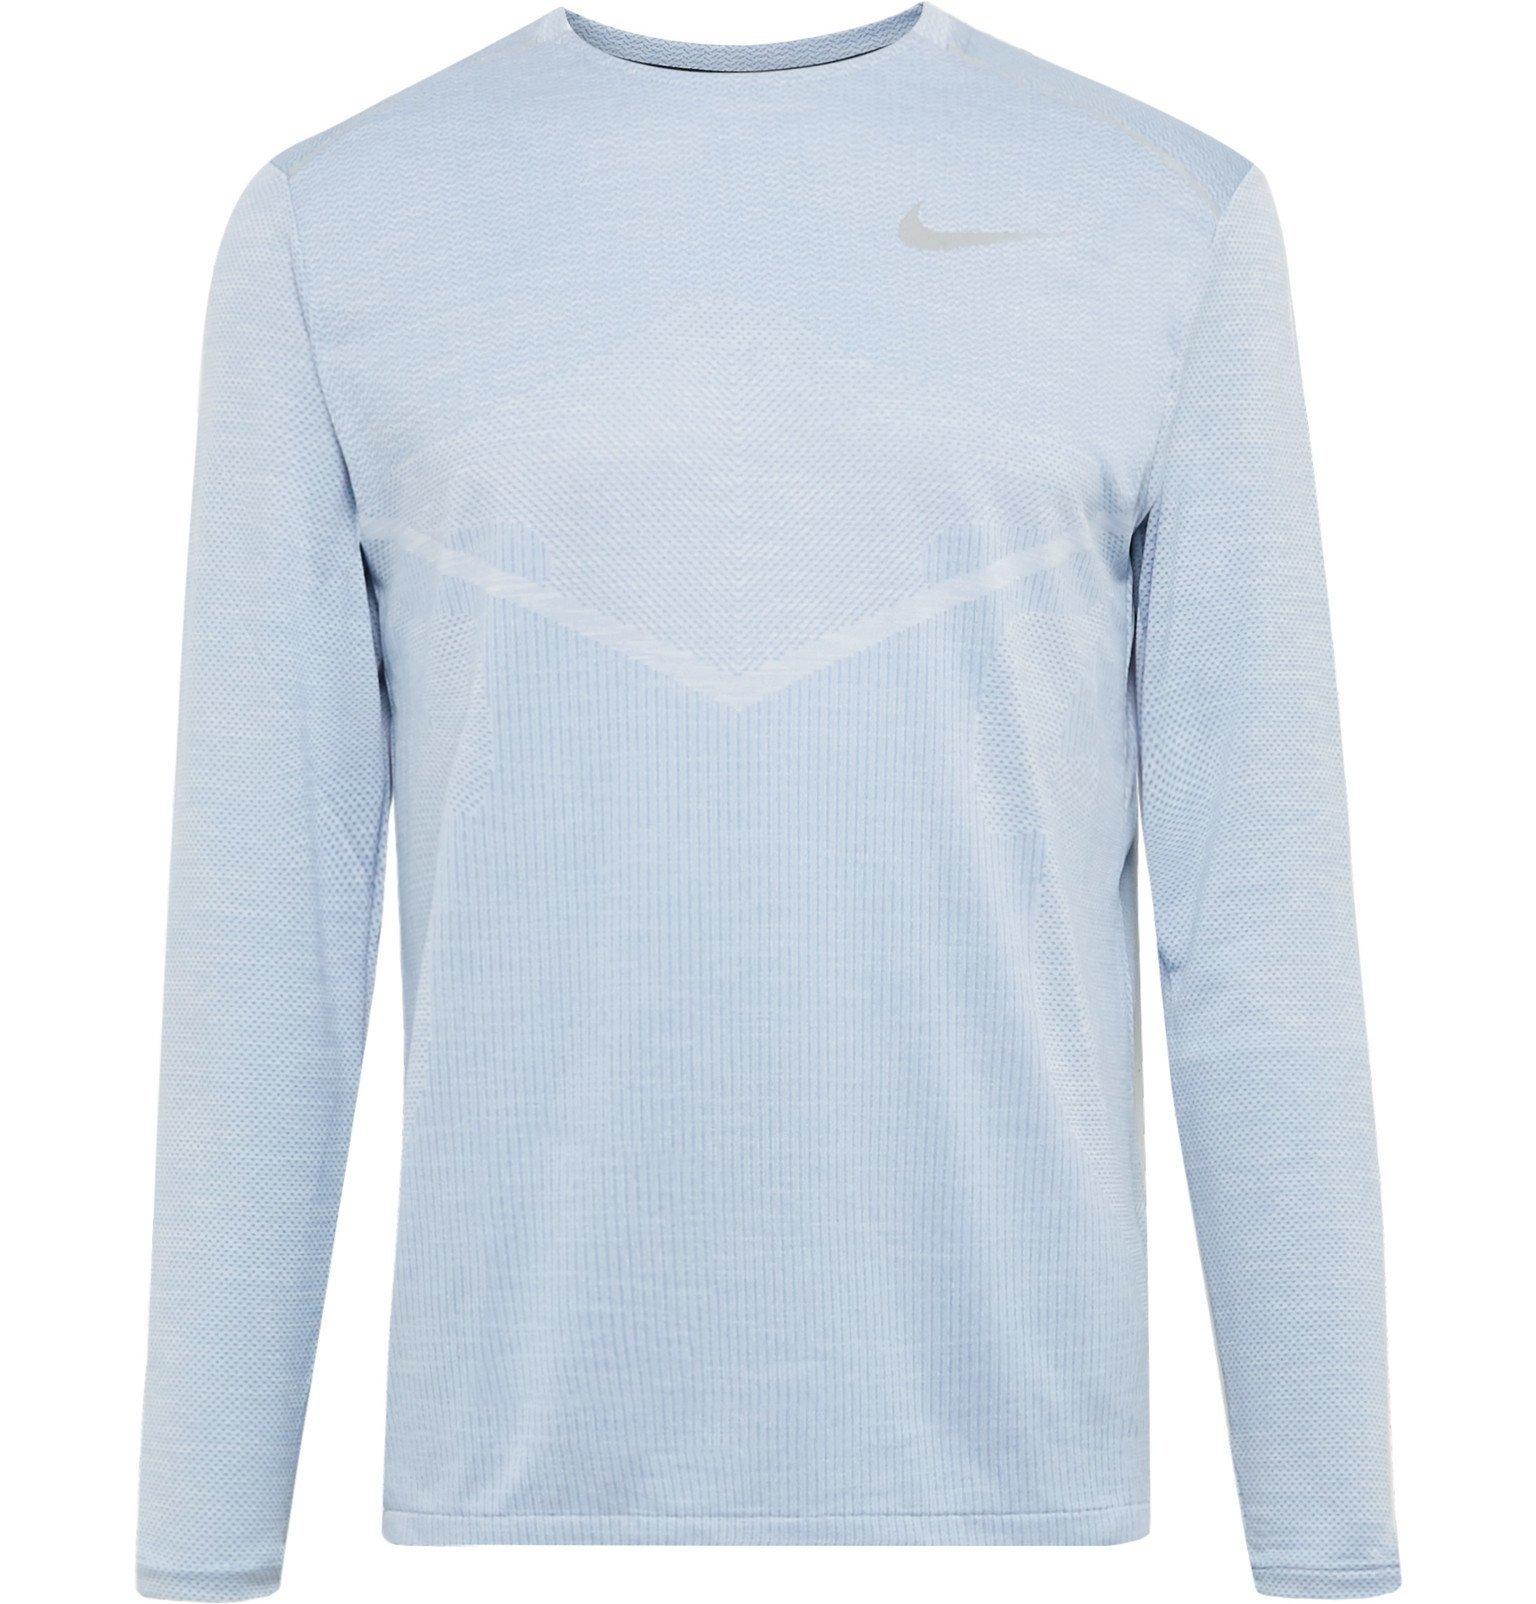 Nike Running - Ultra TechKnit T-Shirt - Blue